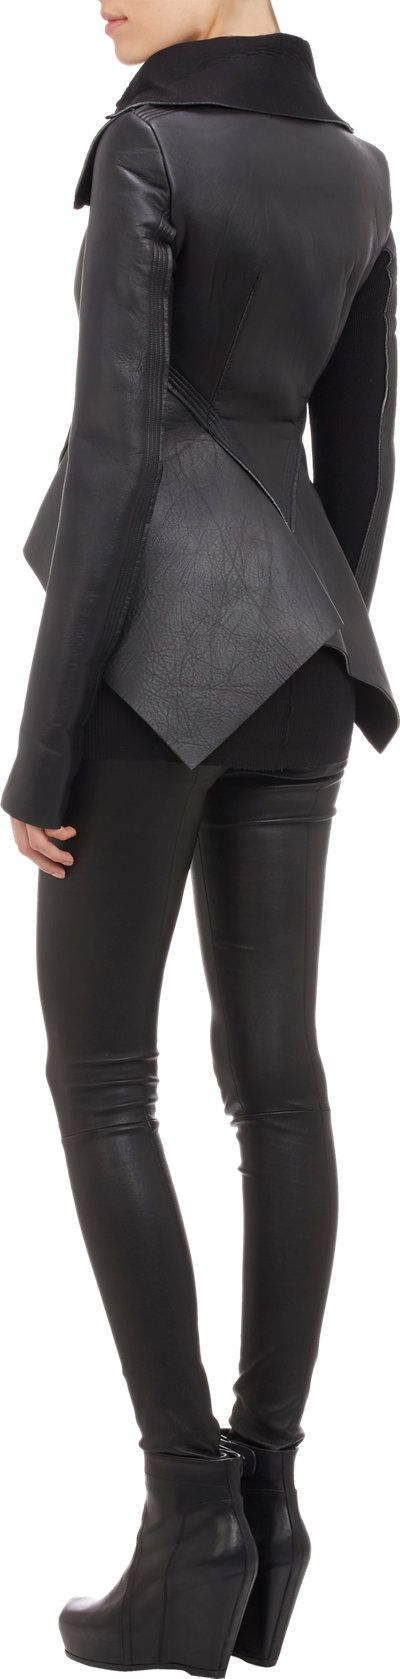 Rick Owens Leather & Neoprene Peplum Jacket at Barneys.com